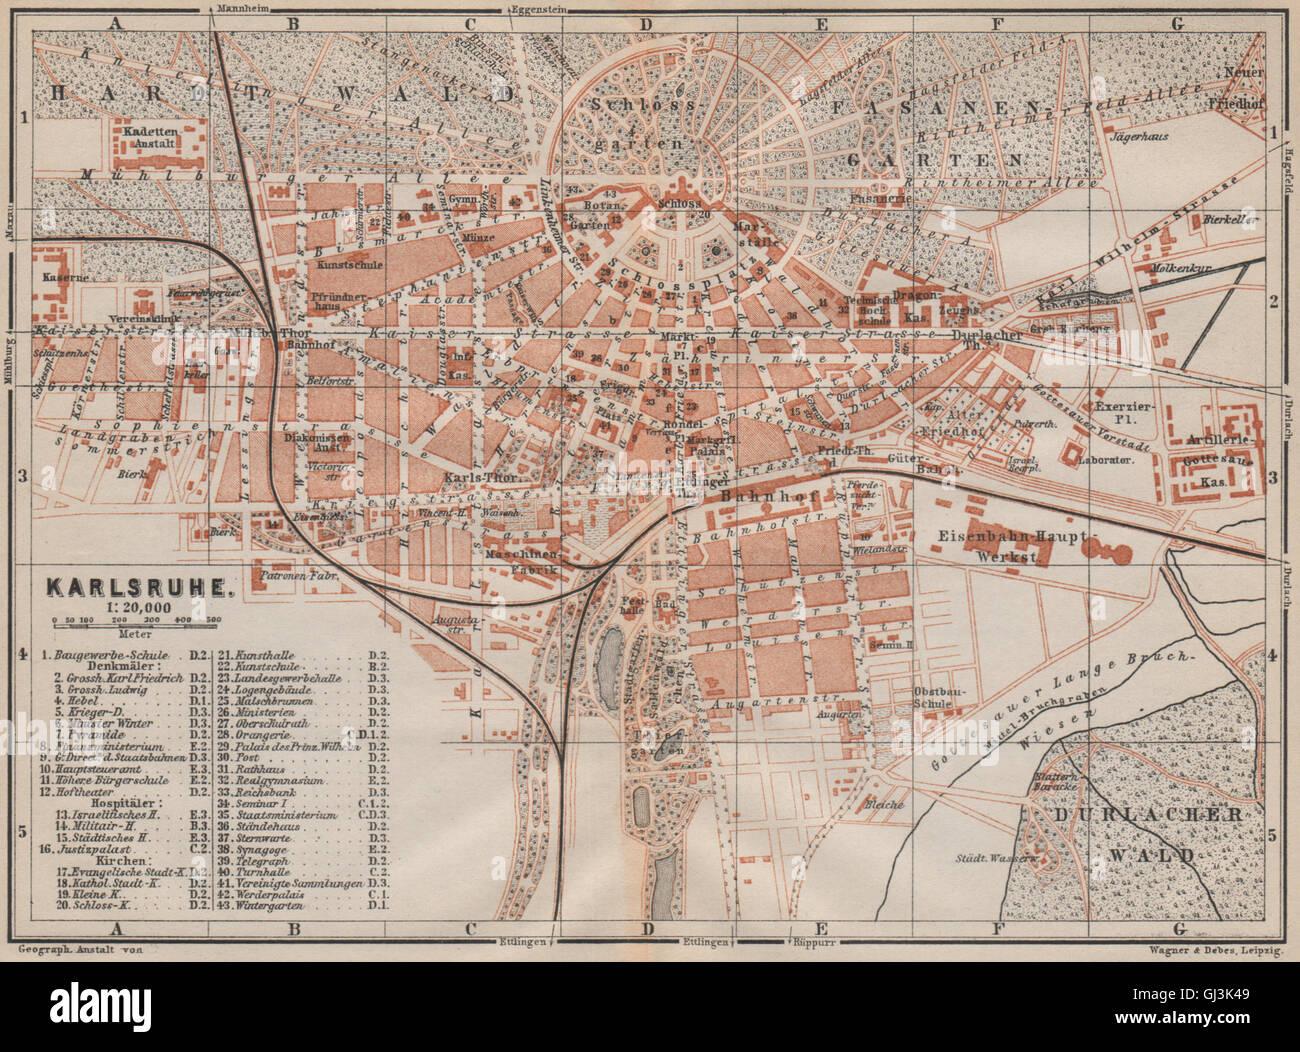 Karte Karlsruhe.Karlsruhe Antique Town City Stadtplan Baden Württemberg Karte 1892